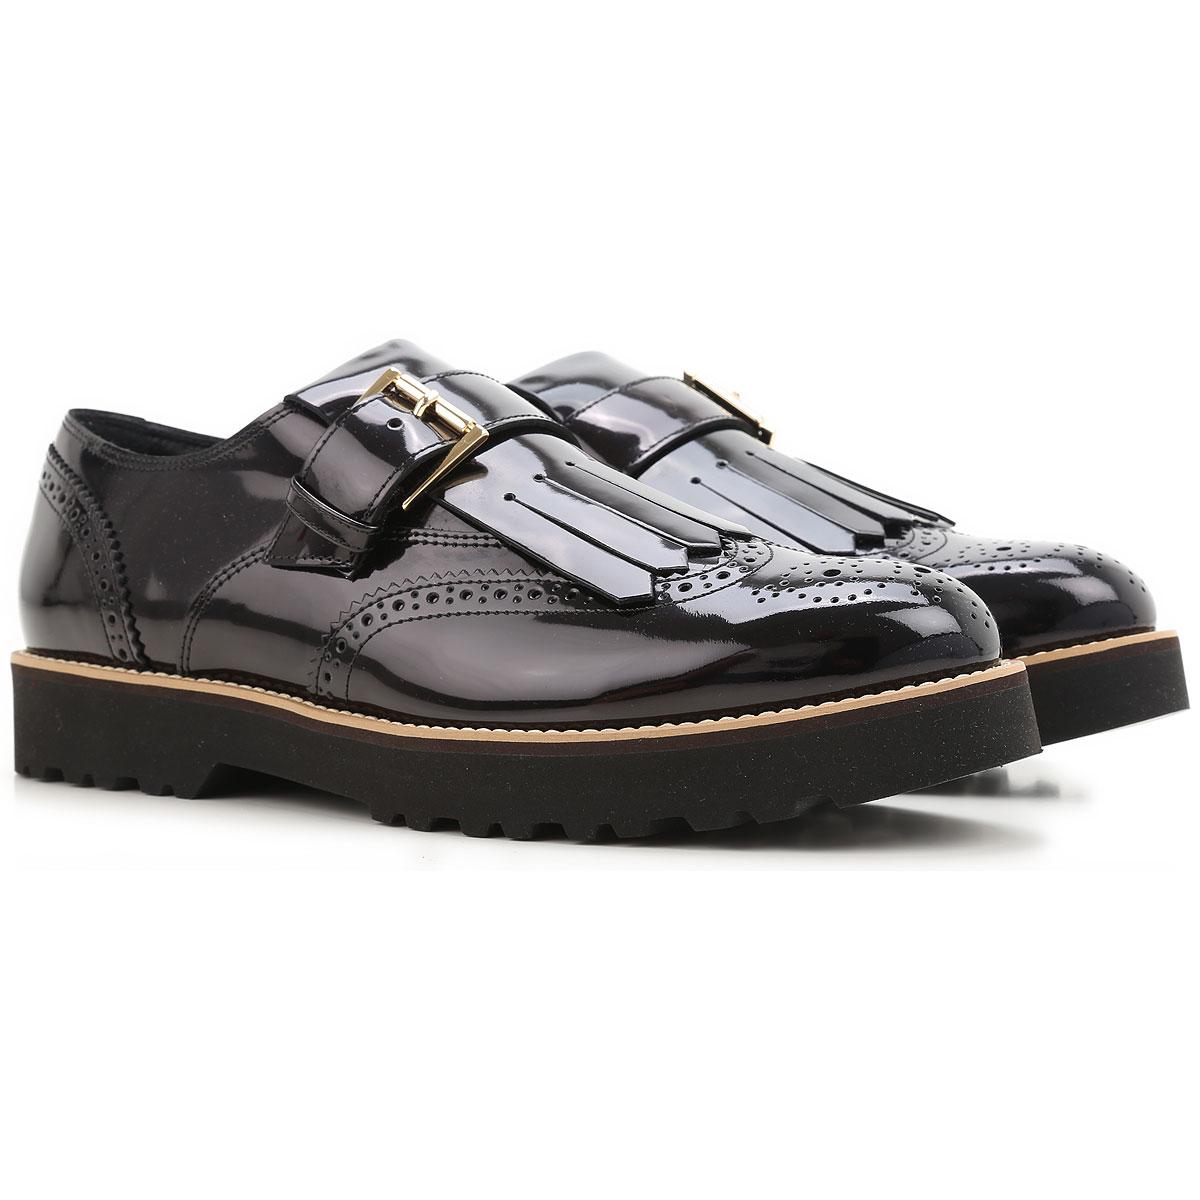 Hogan Women, Shoes, hxw2590w5901qab999